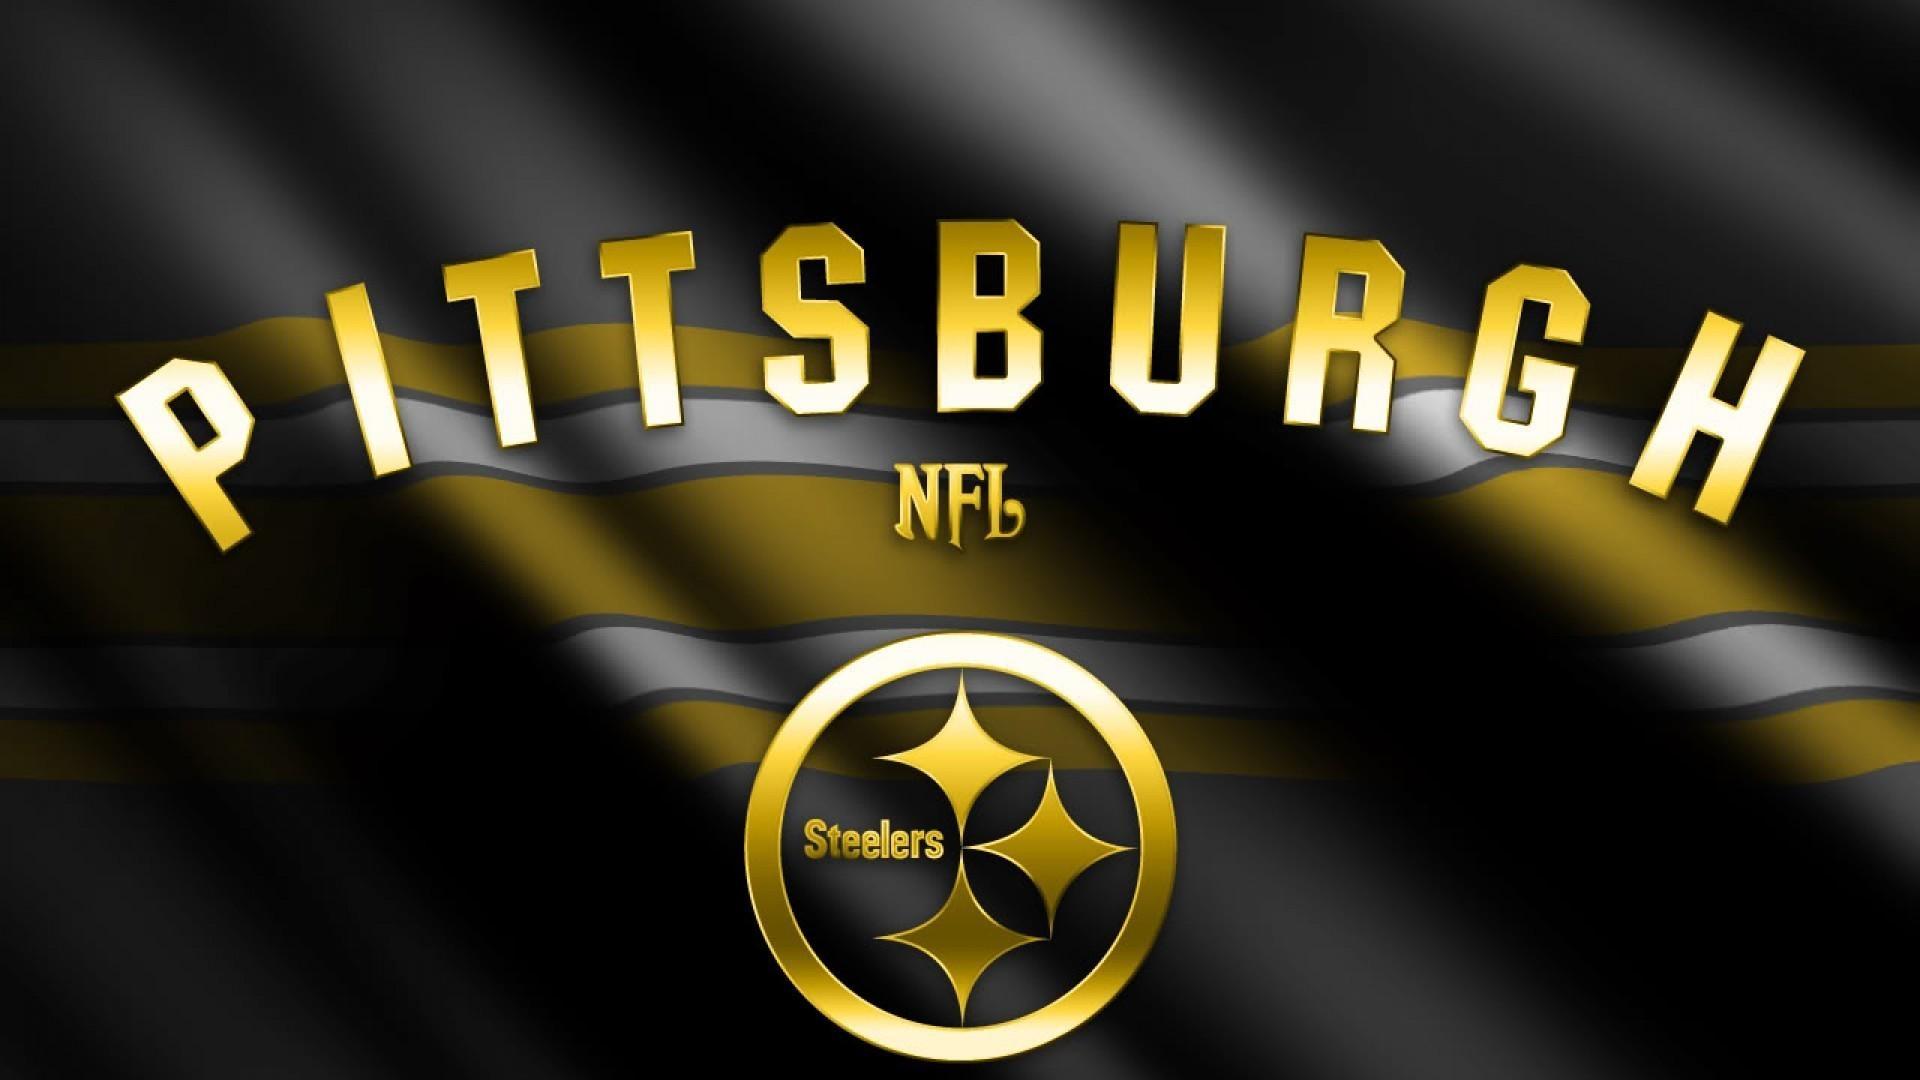 Res: 1920x1080, 2160x1920 Steelers-wallpaper-9952223-by-derek6571